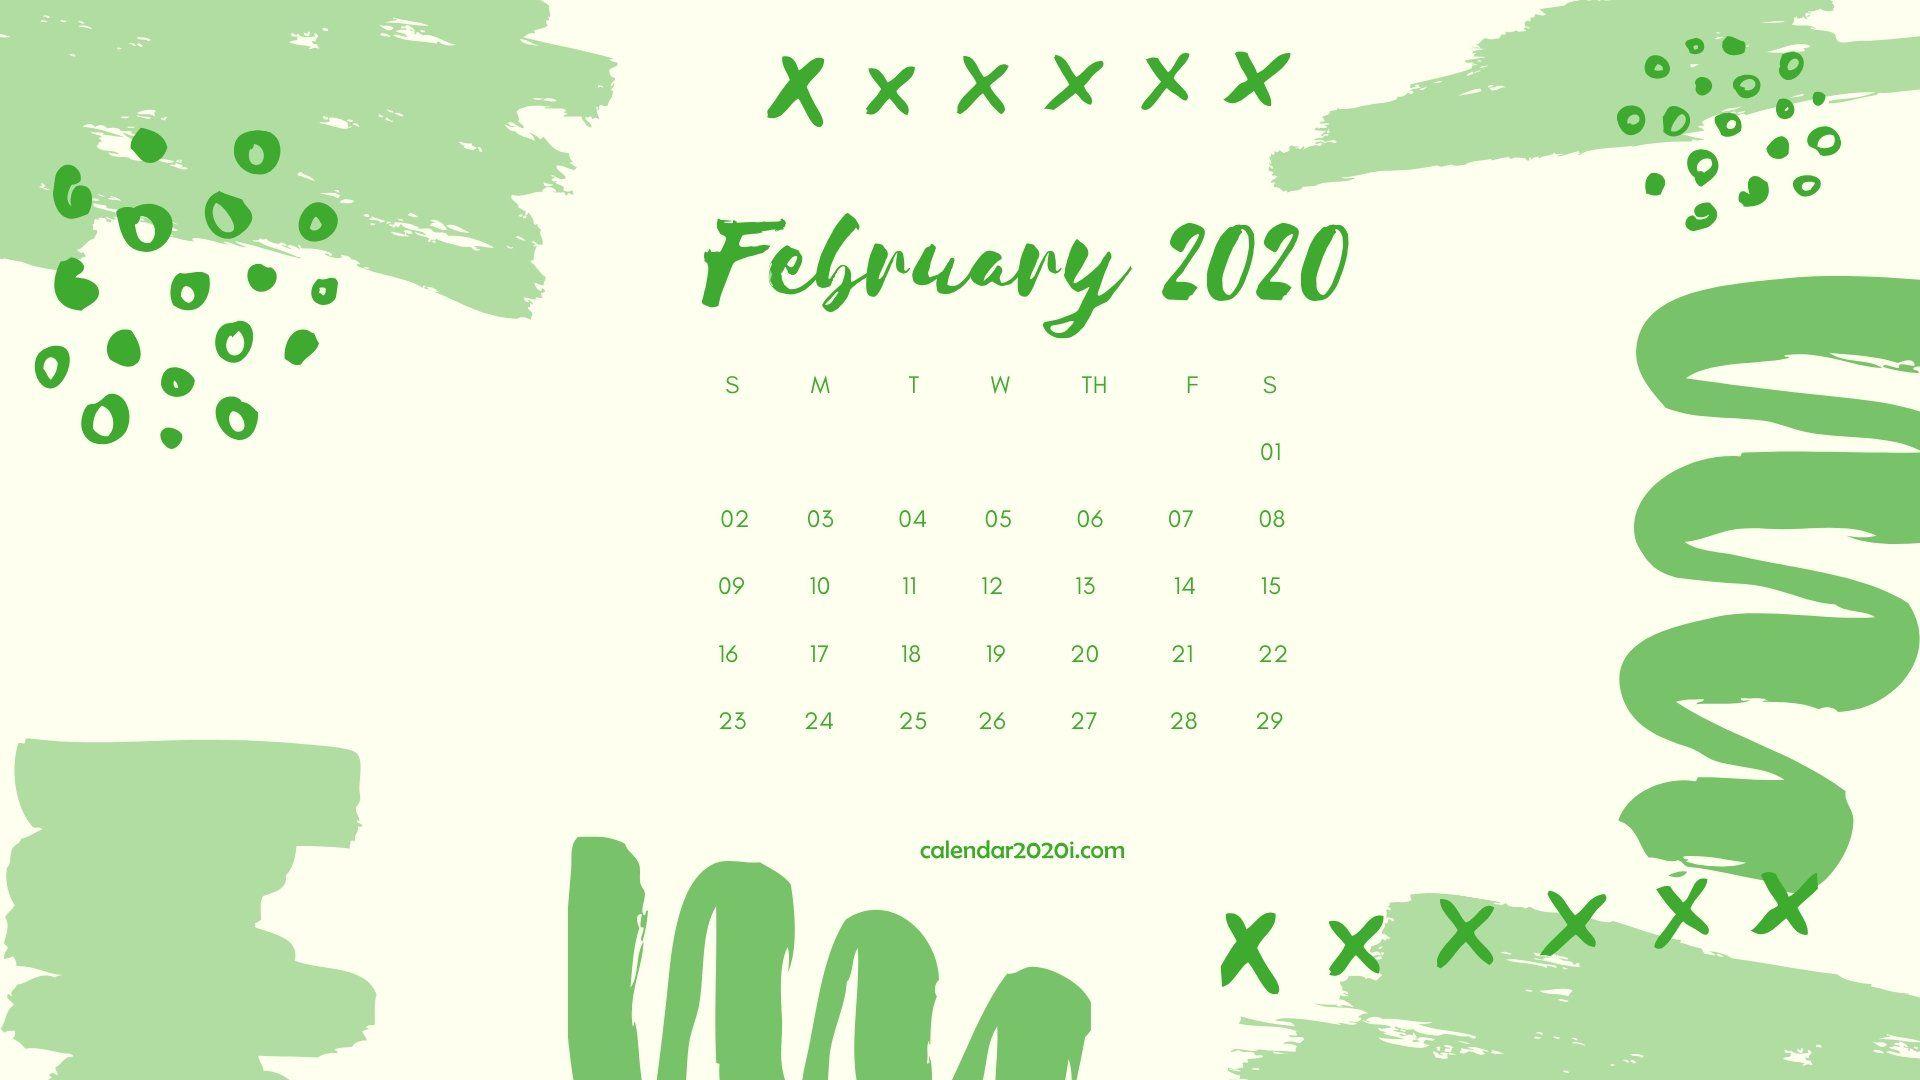 February 2020 Calendar Desktop Wallpaper Printable calendar 1920x1080